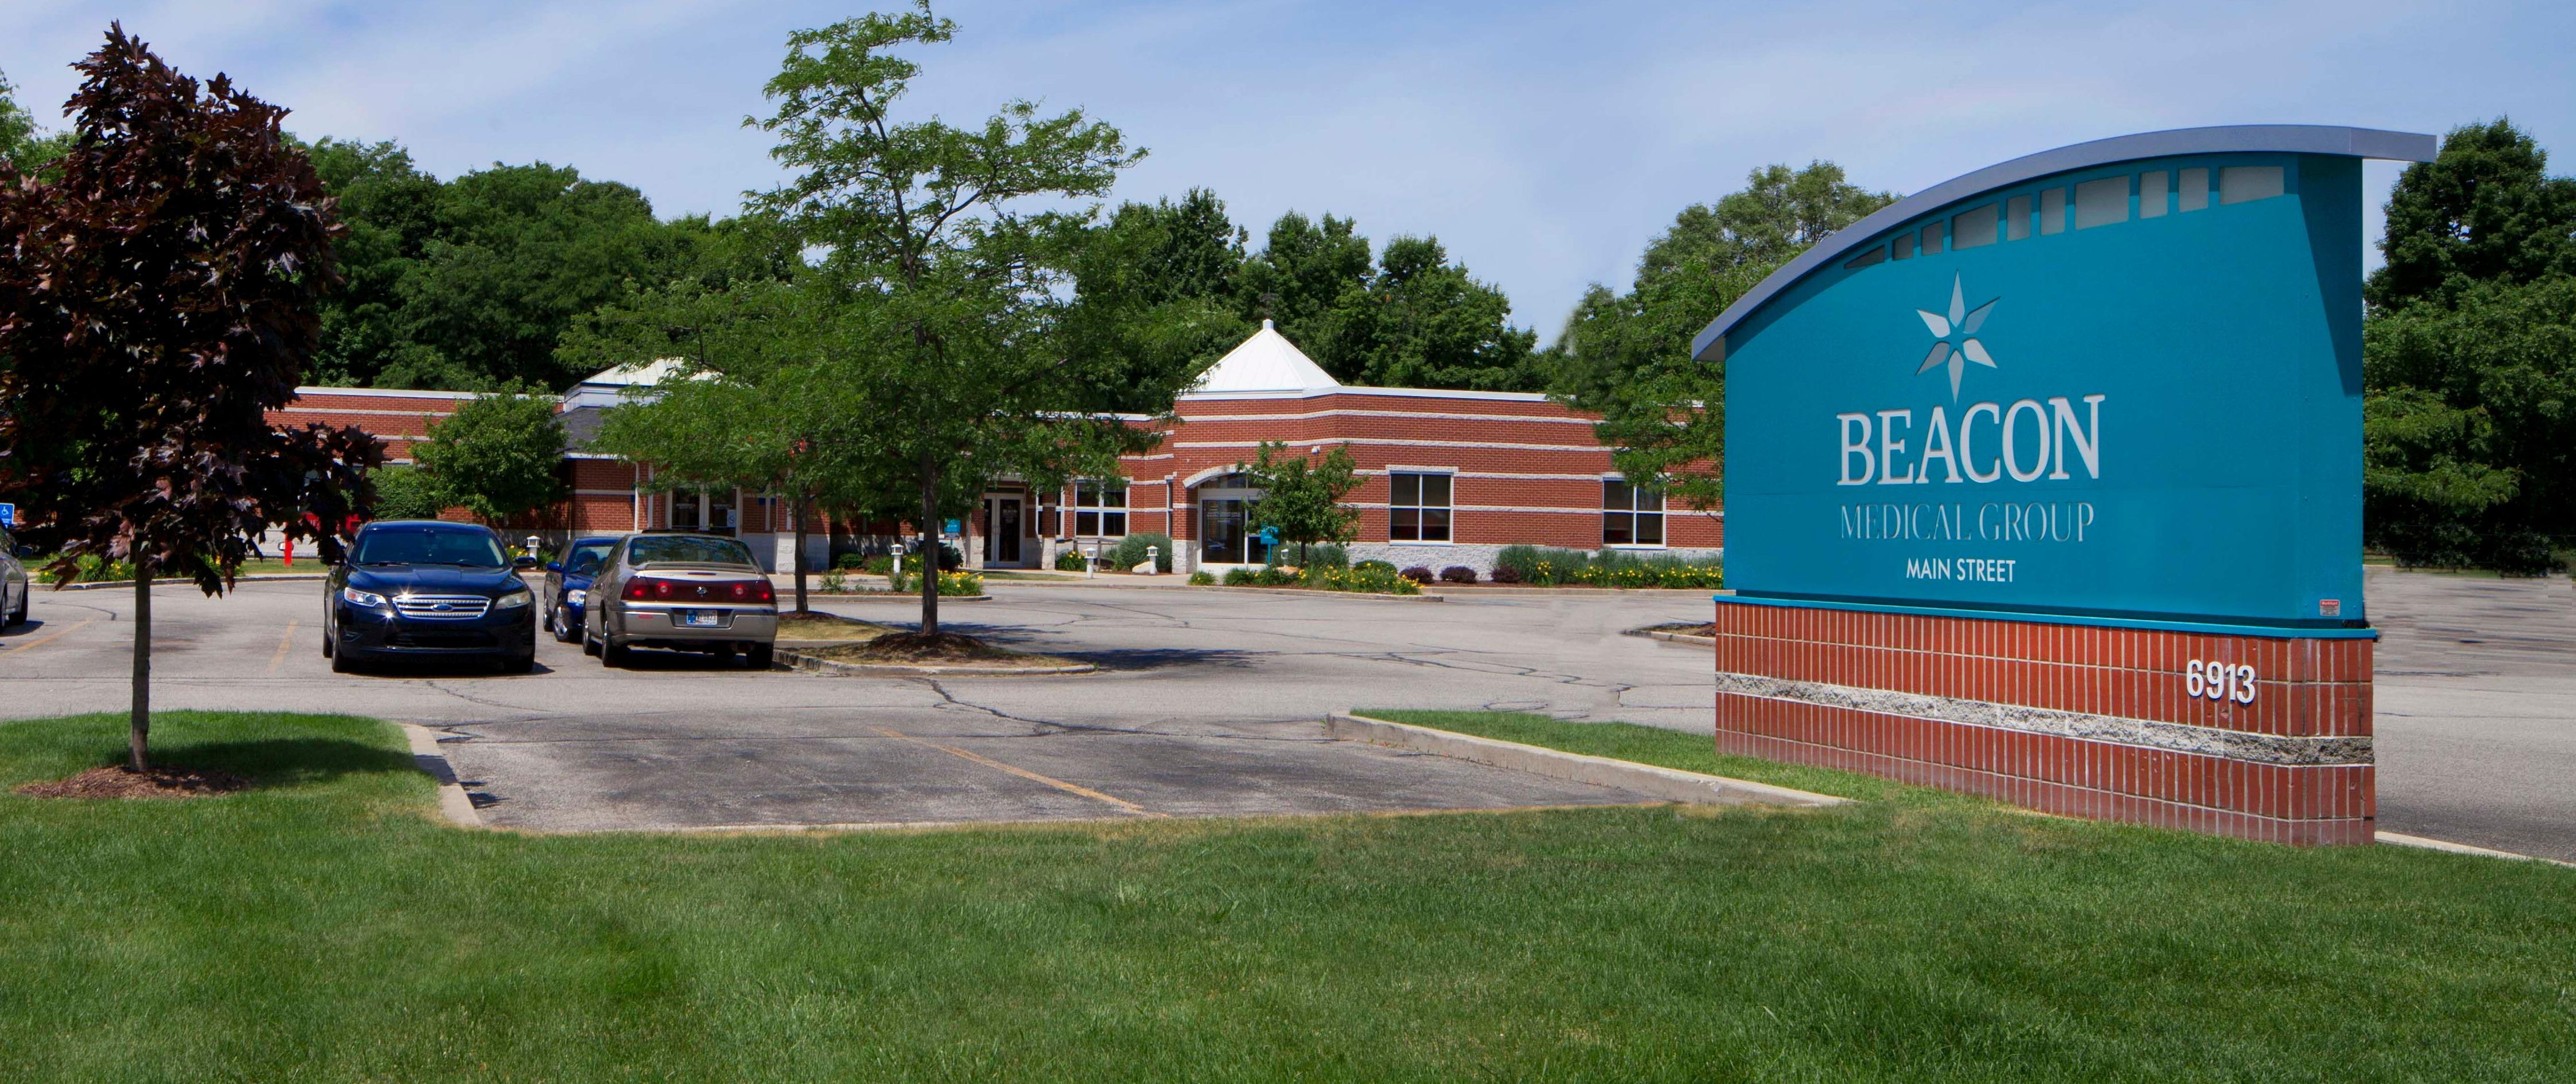 Beacon Medical Group Main Street image 0